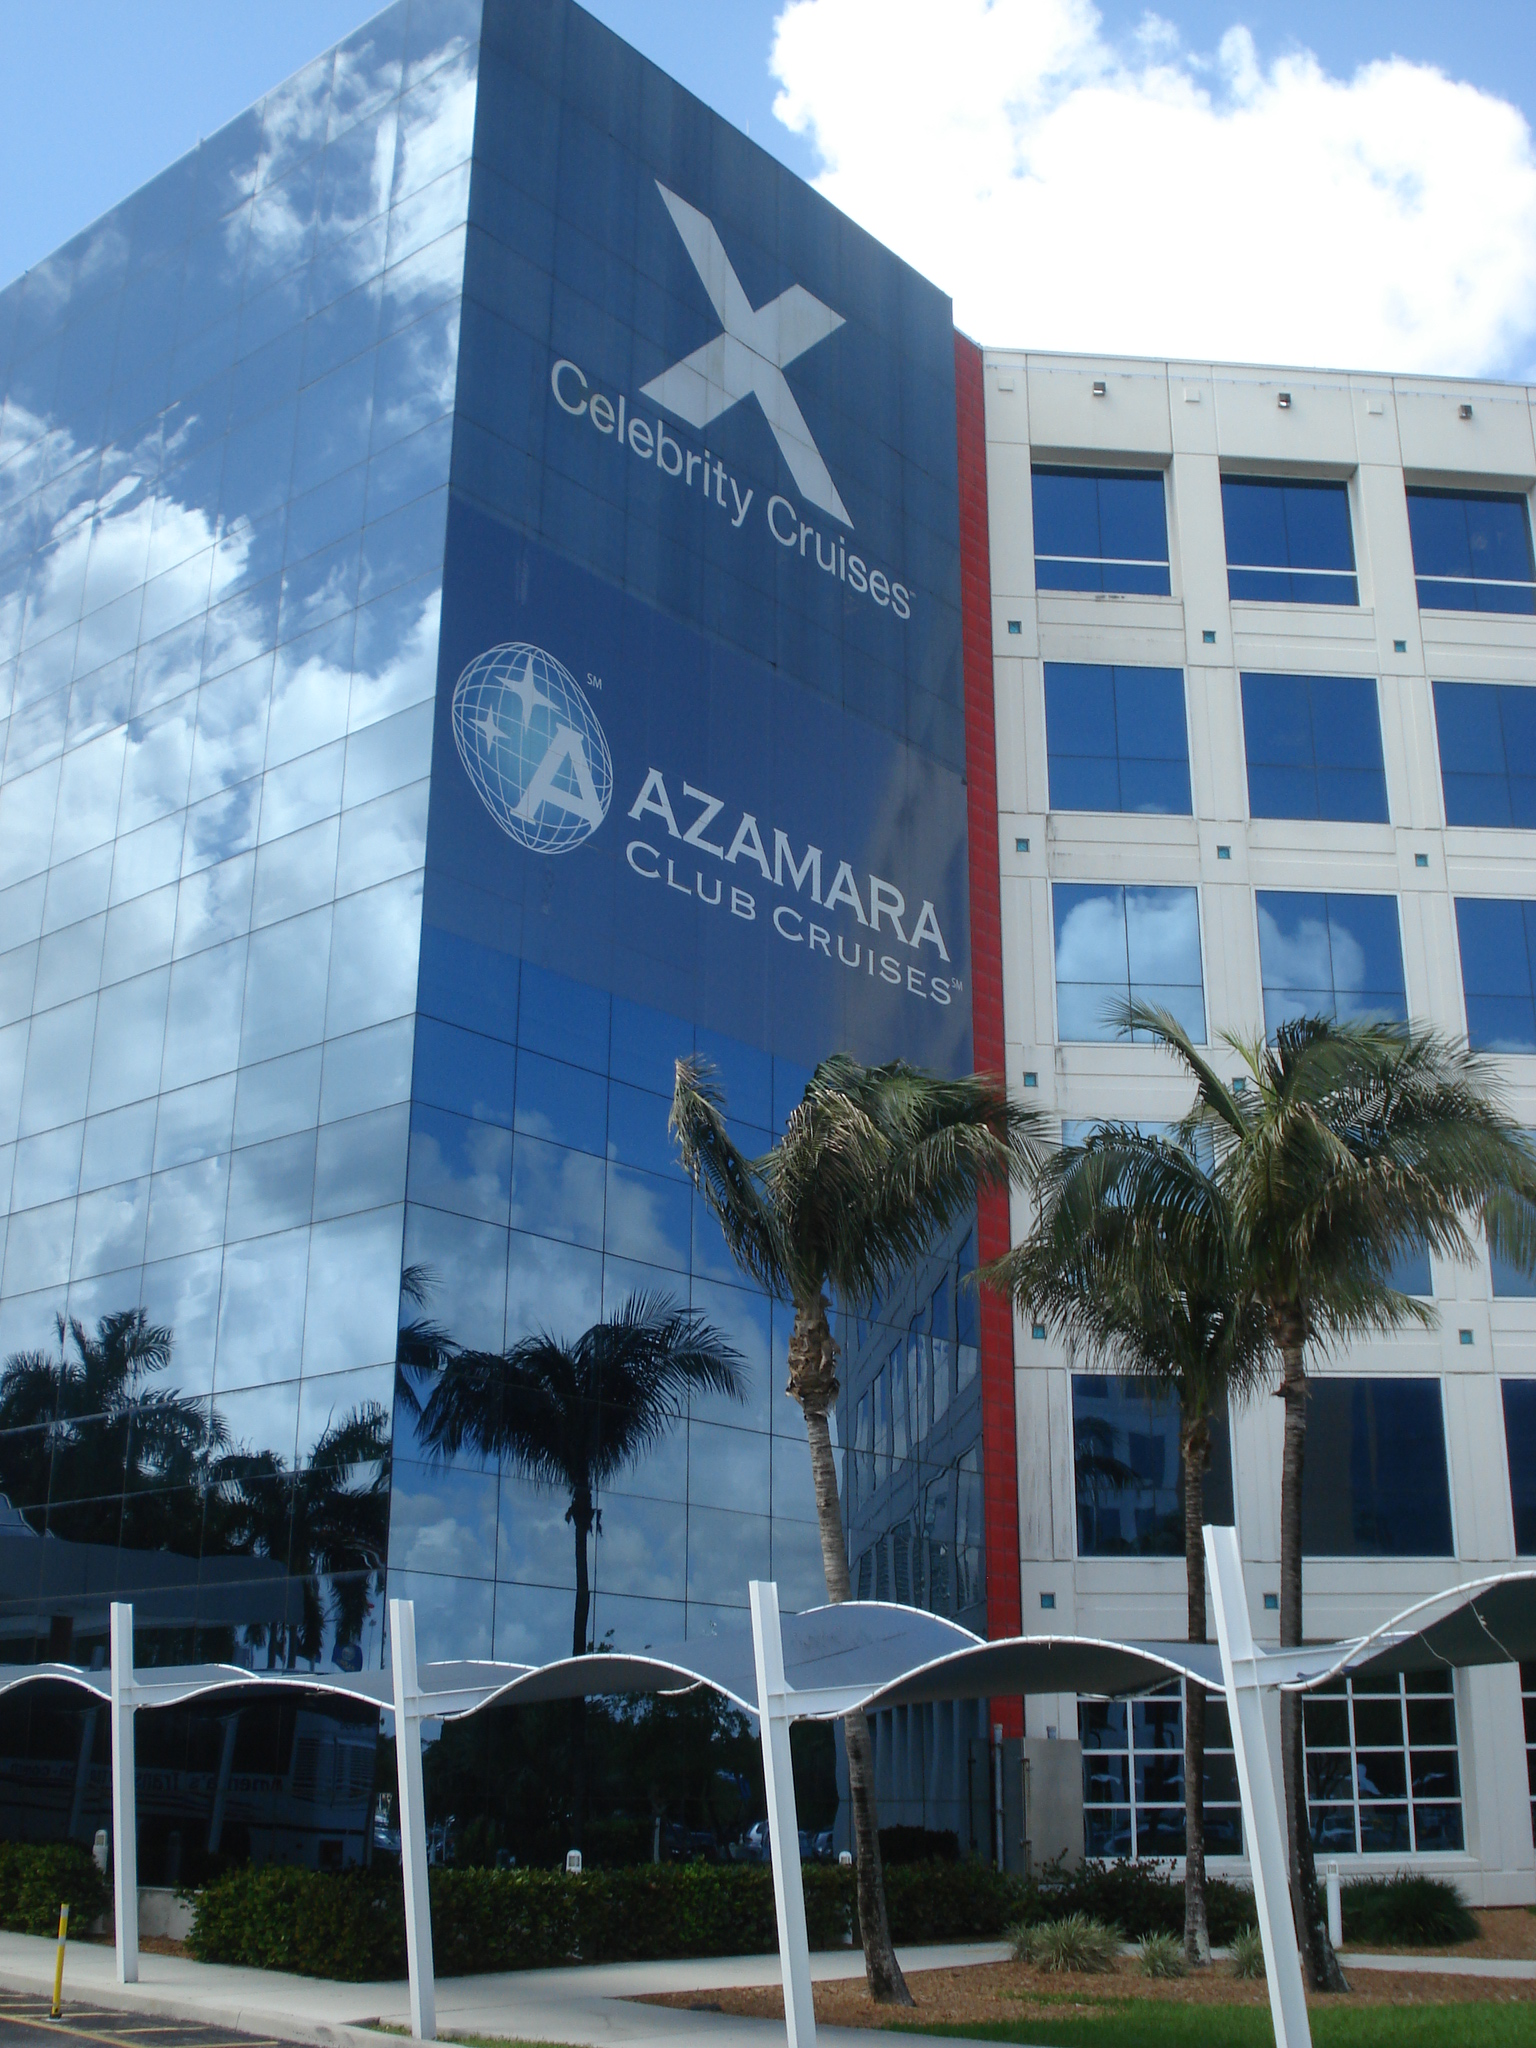 Royal Caribbean Corporate Office